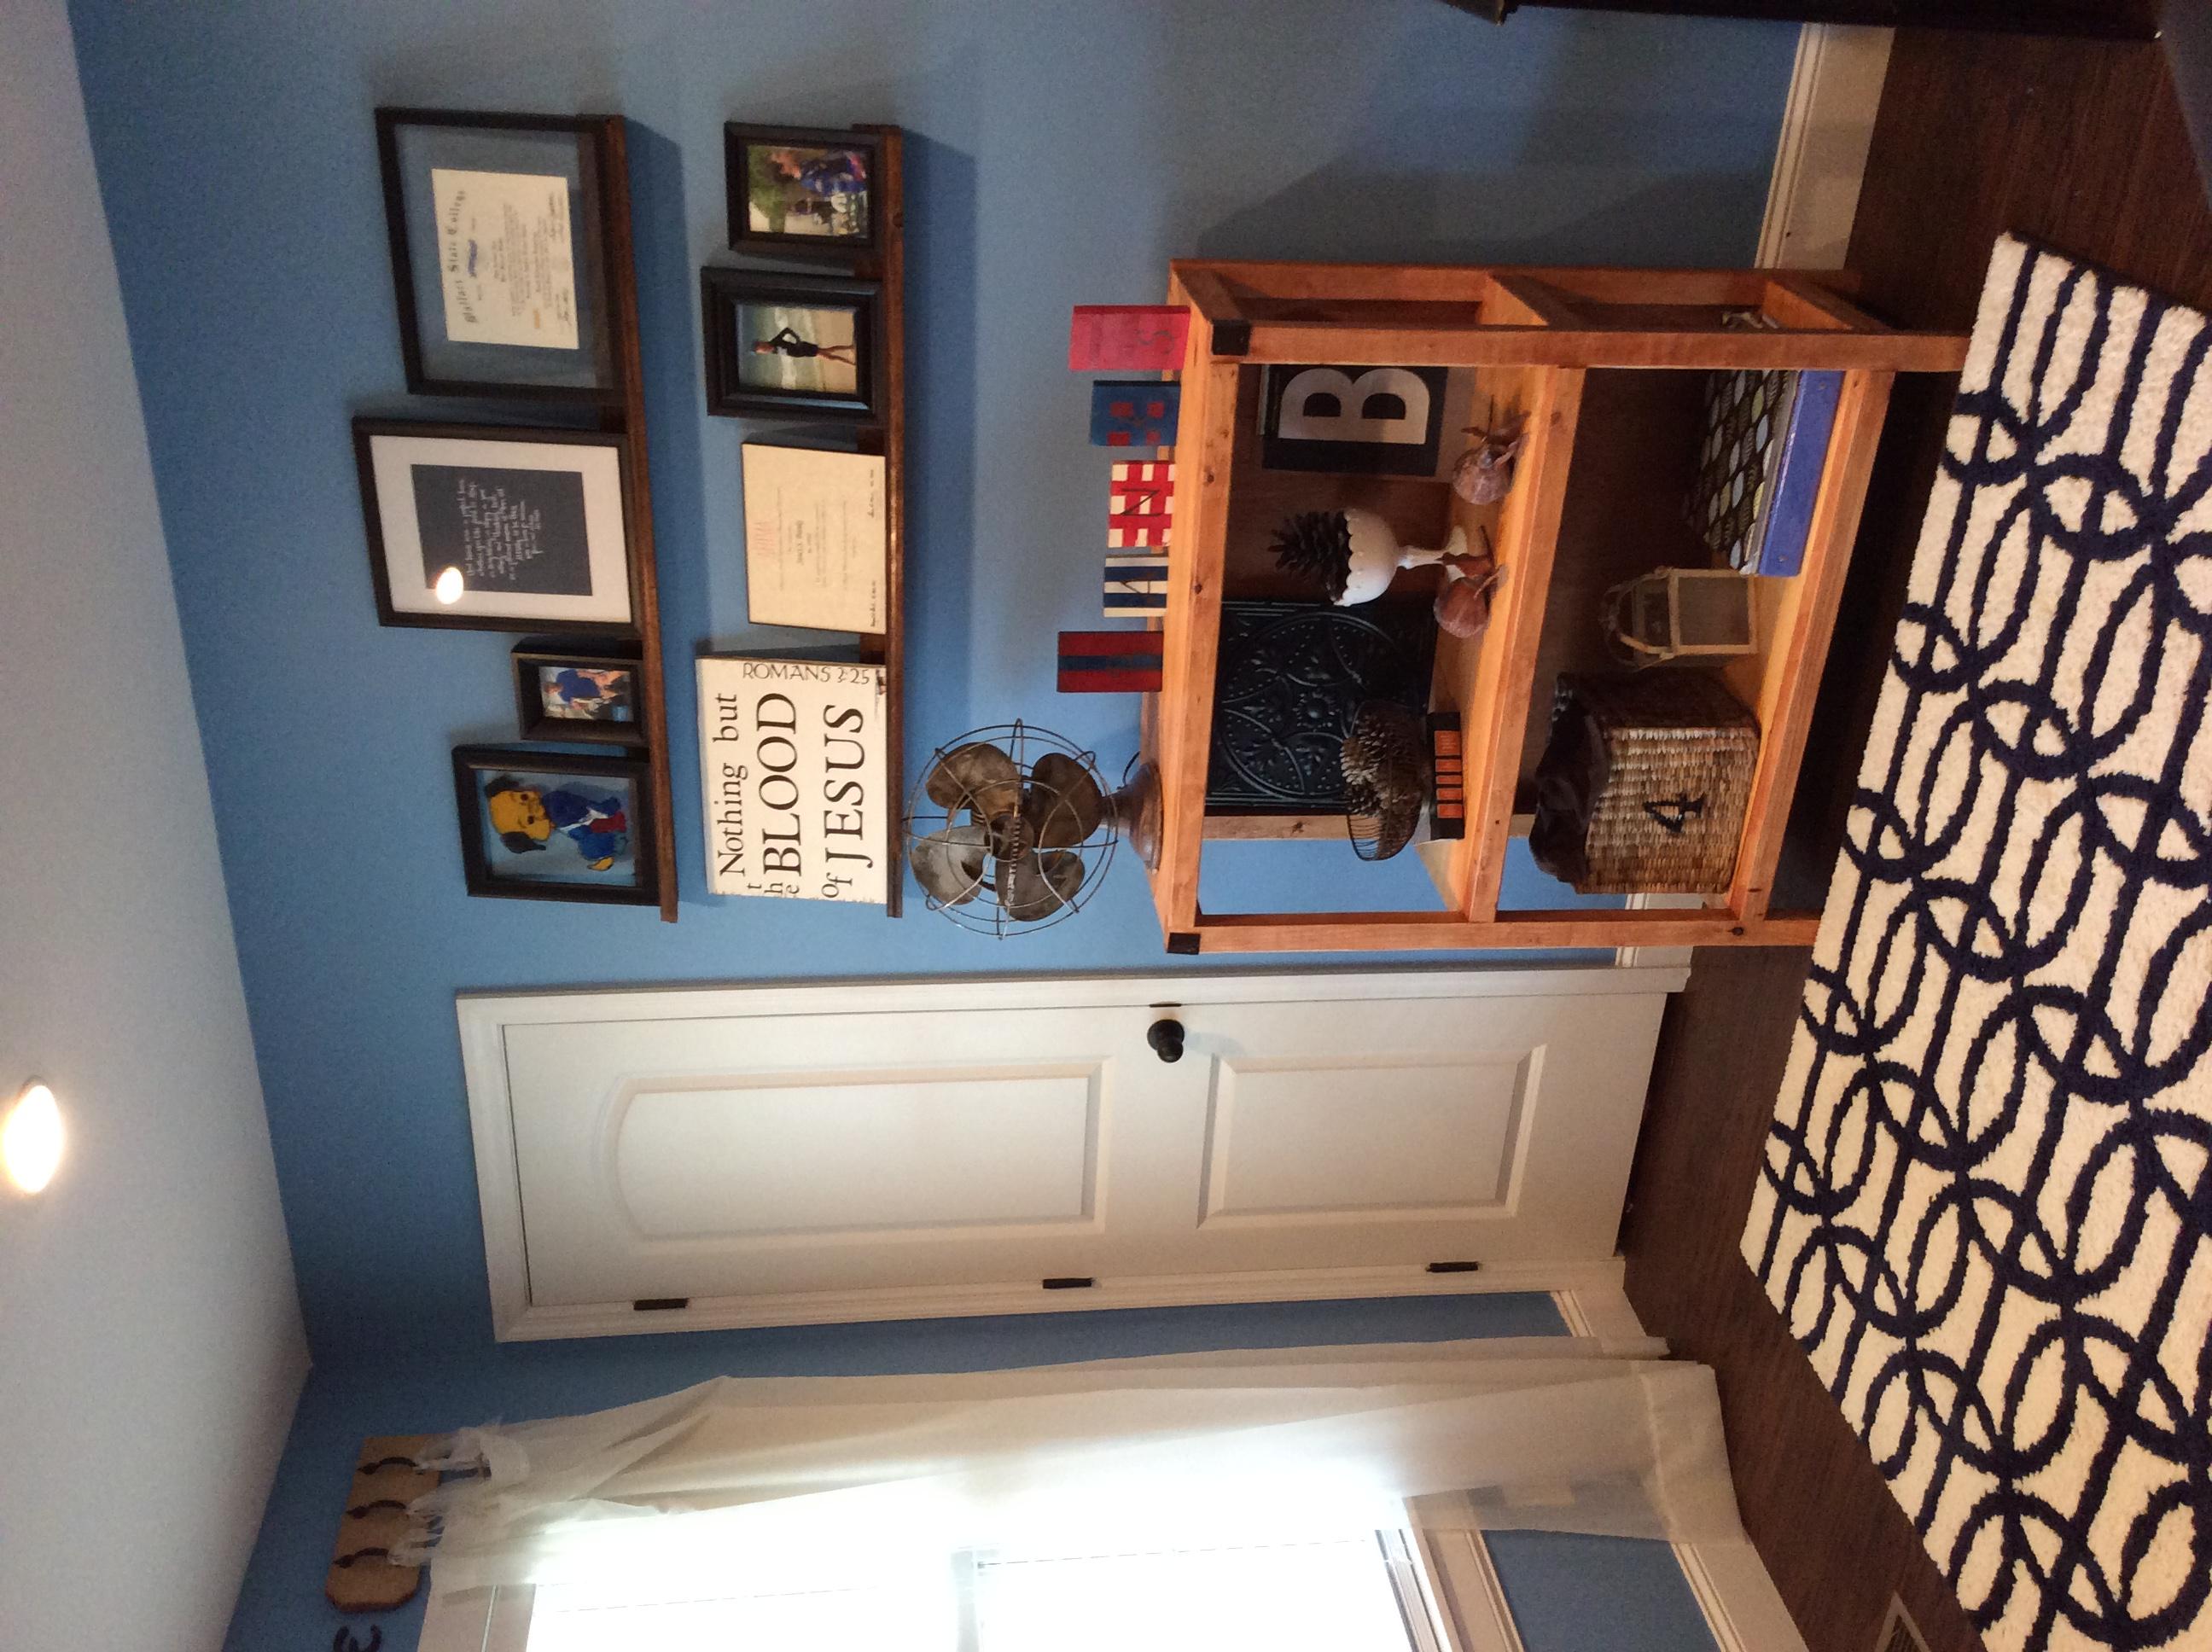 inspired bookshelves shanty barns barn chic pottery diy bookcase